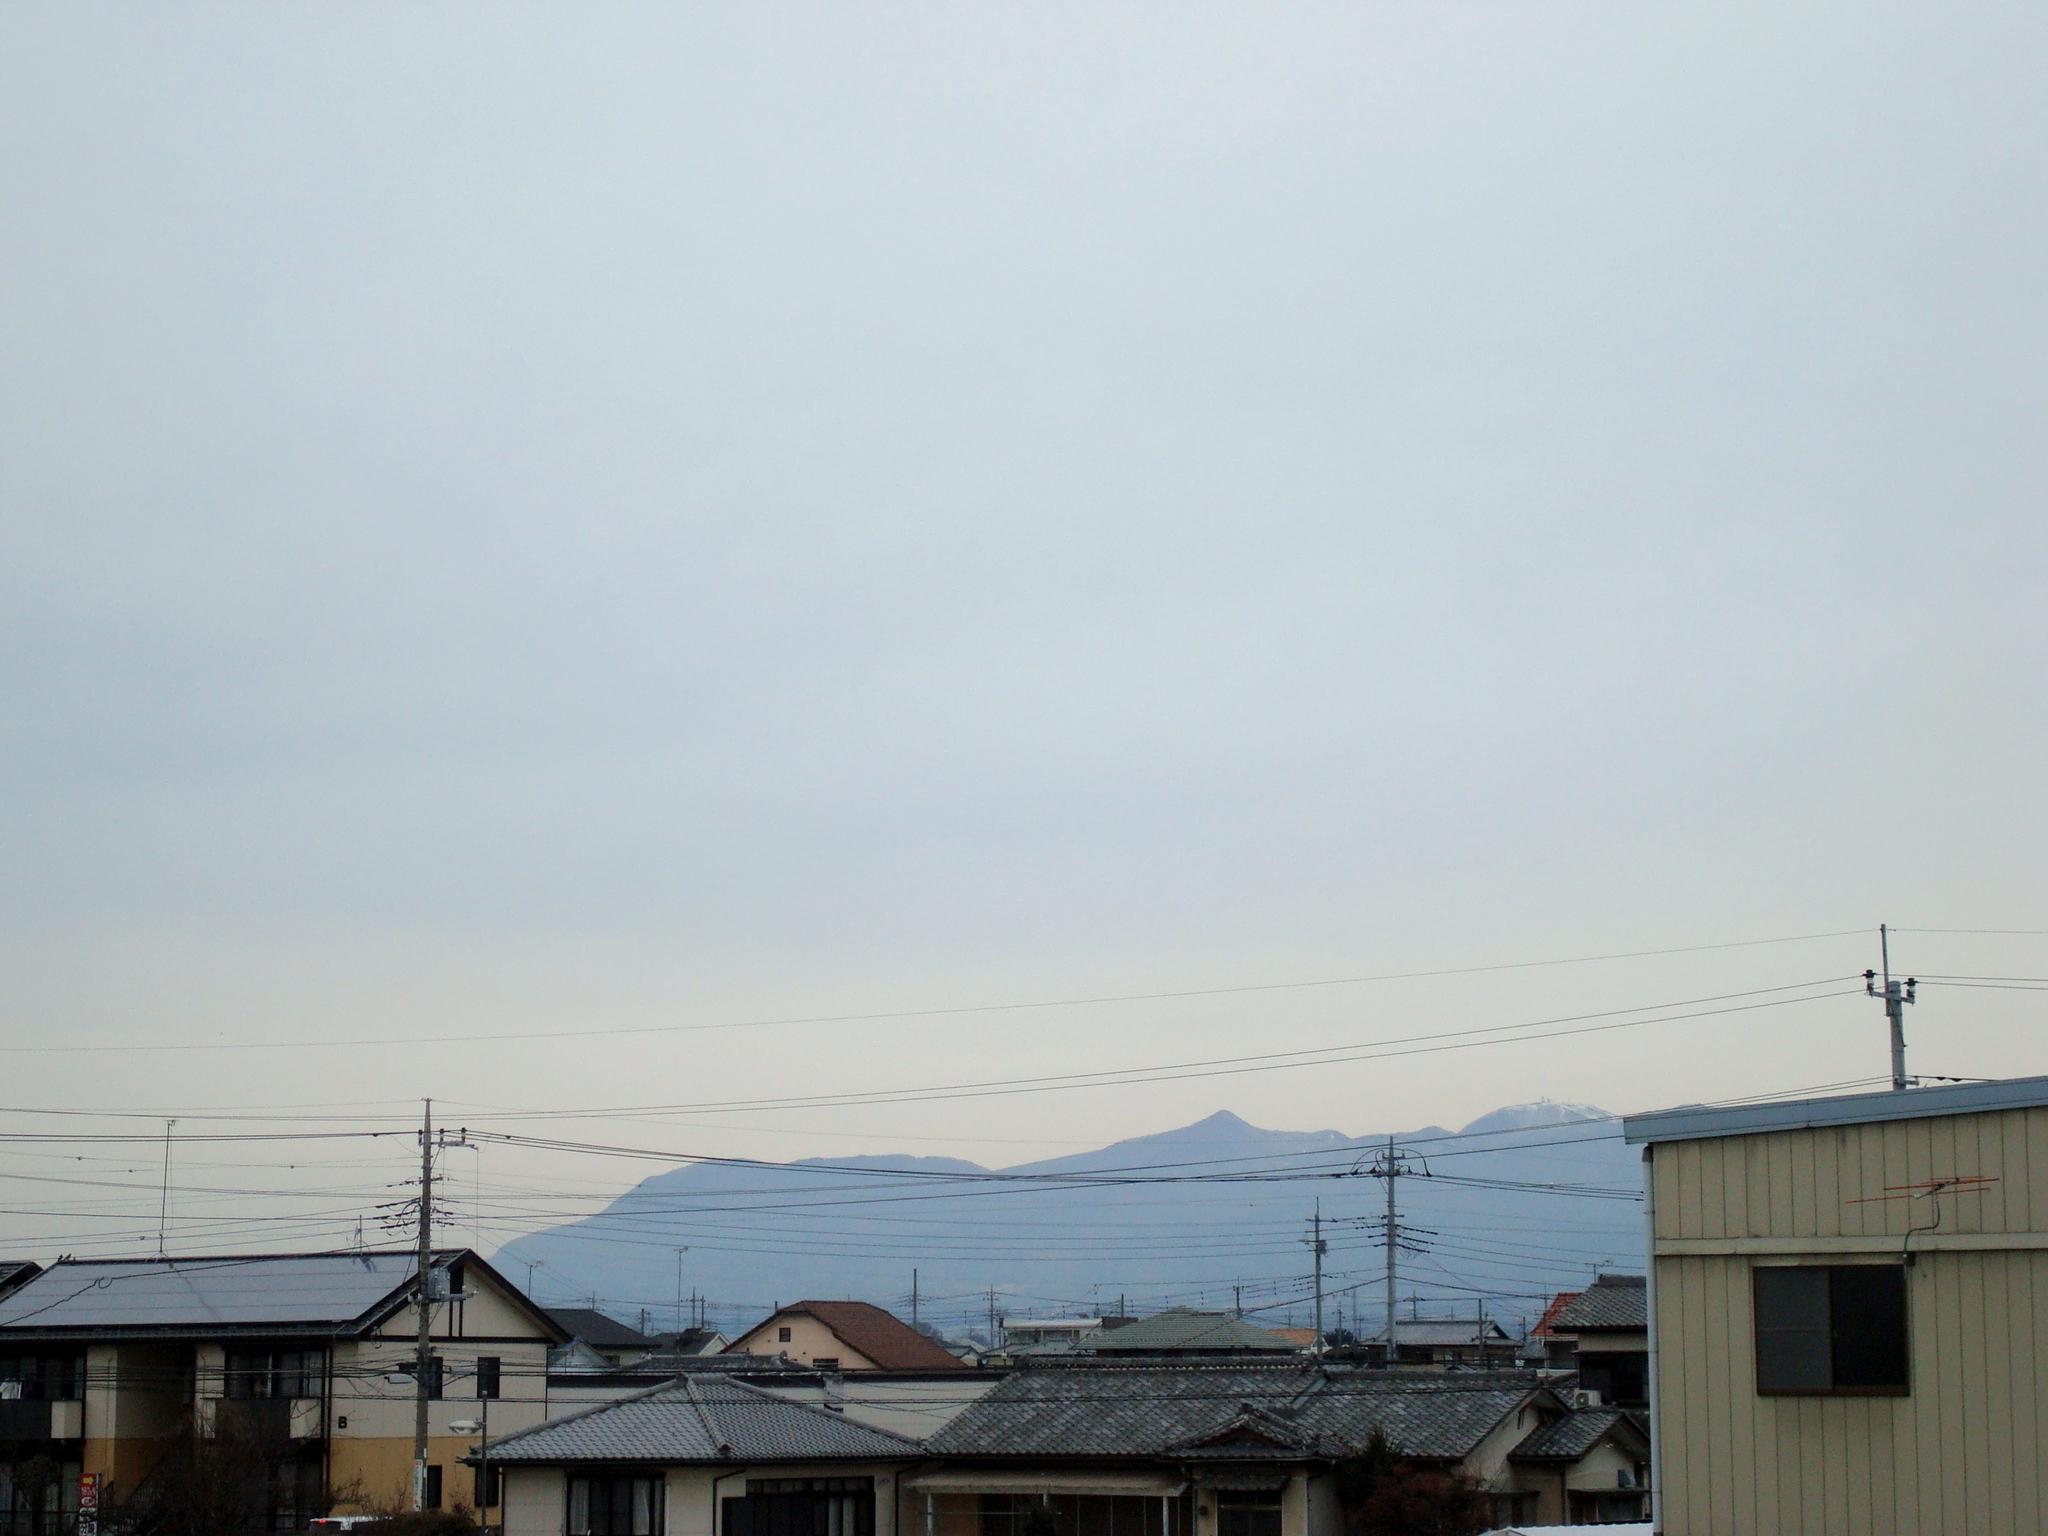 DSC07359.jpg